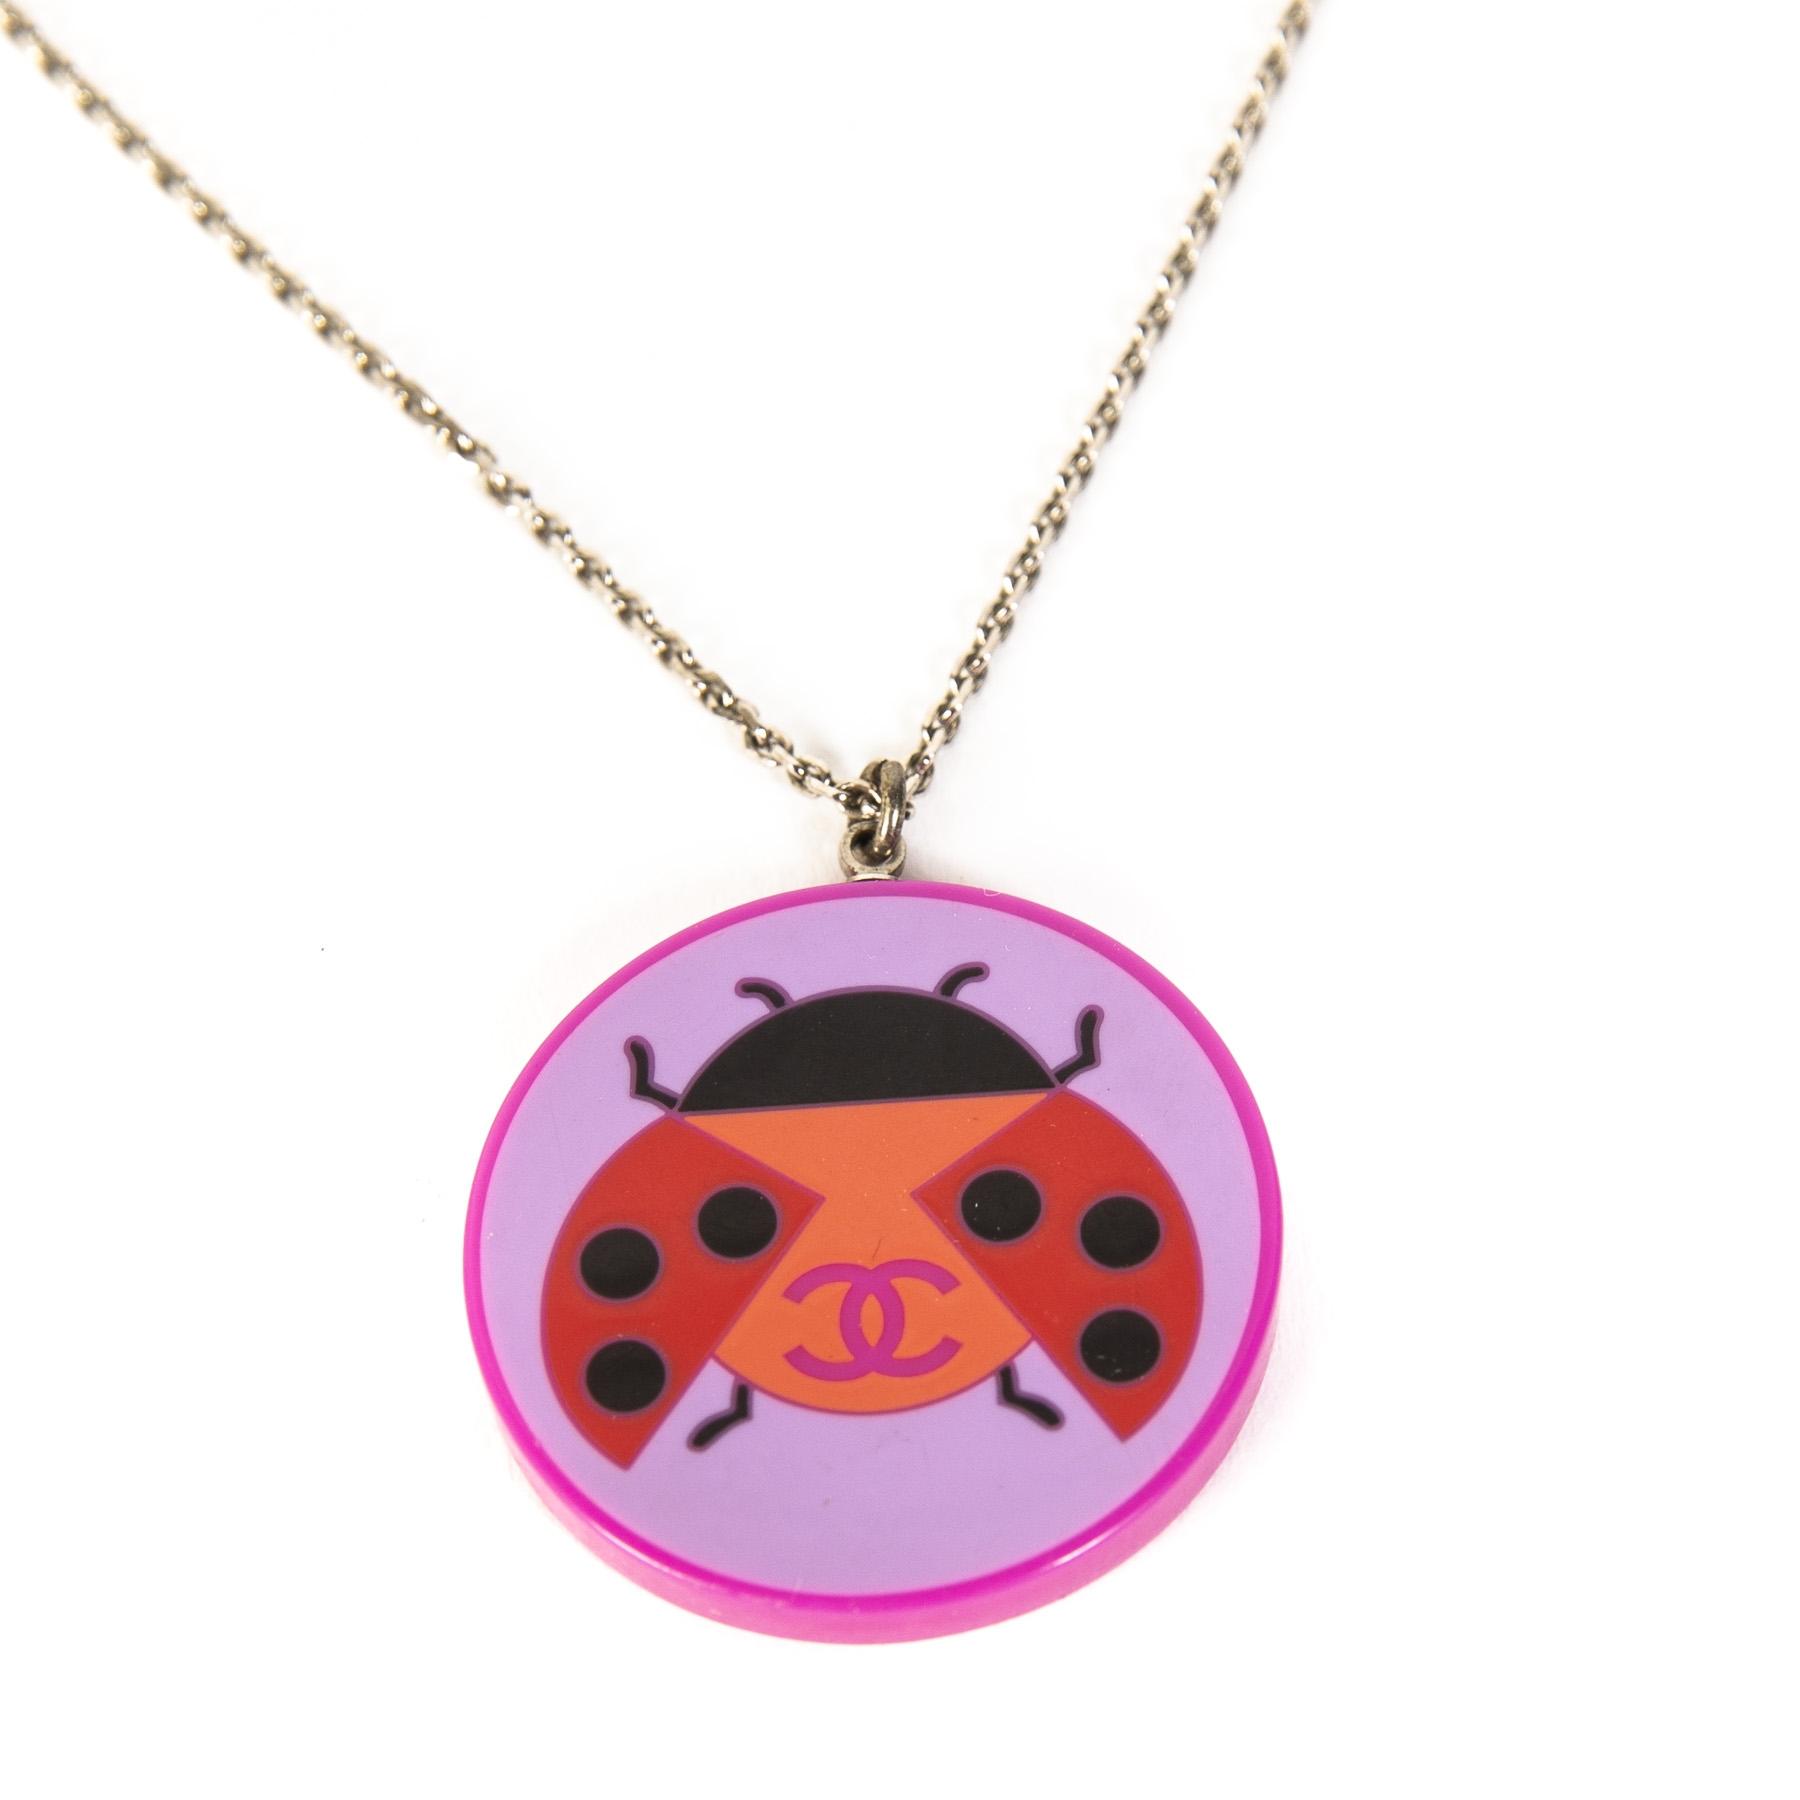 Chanel Purple Ladybuy Pendant Necklace